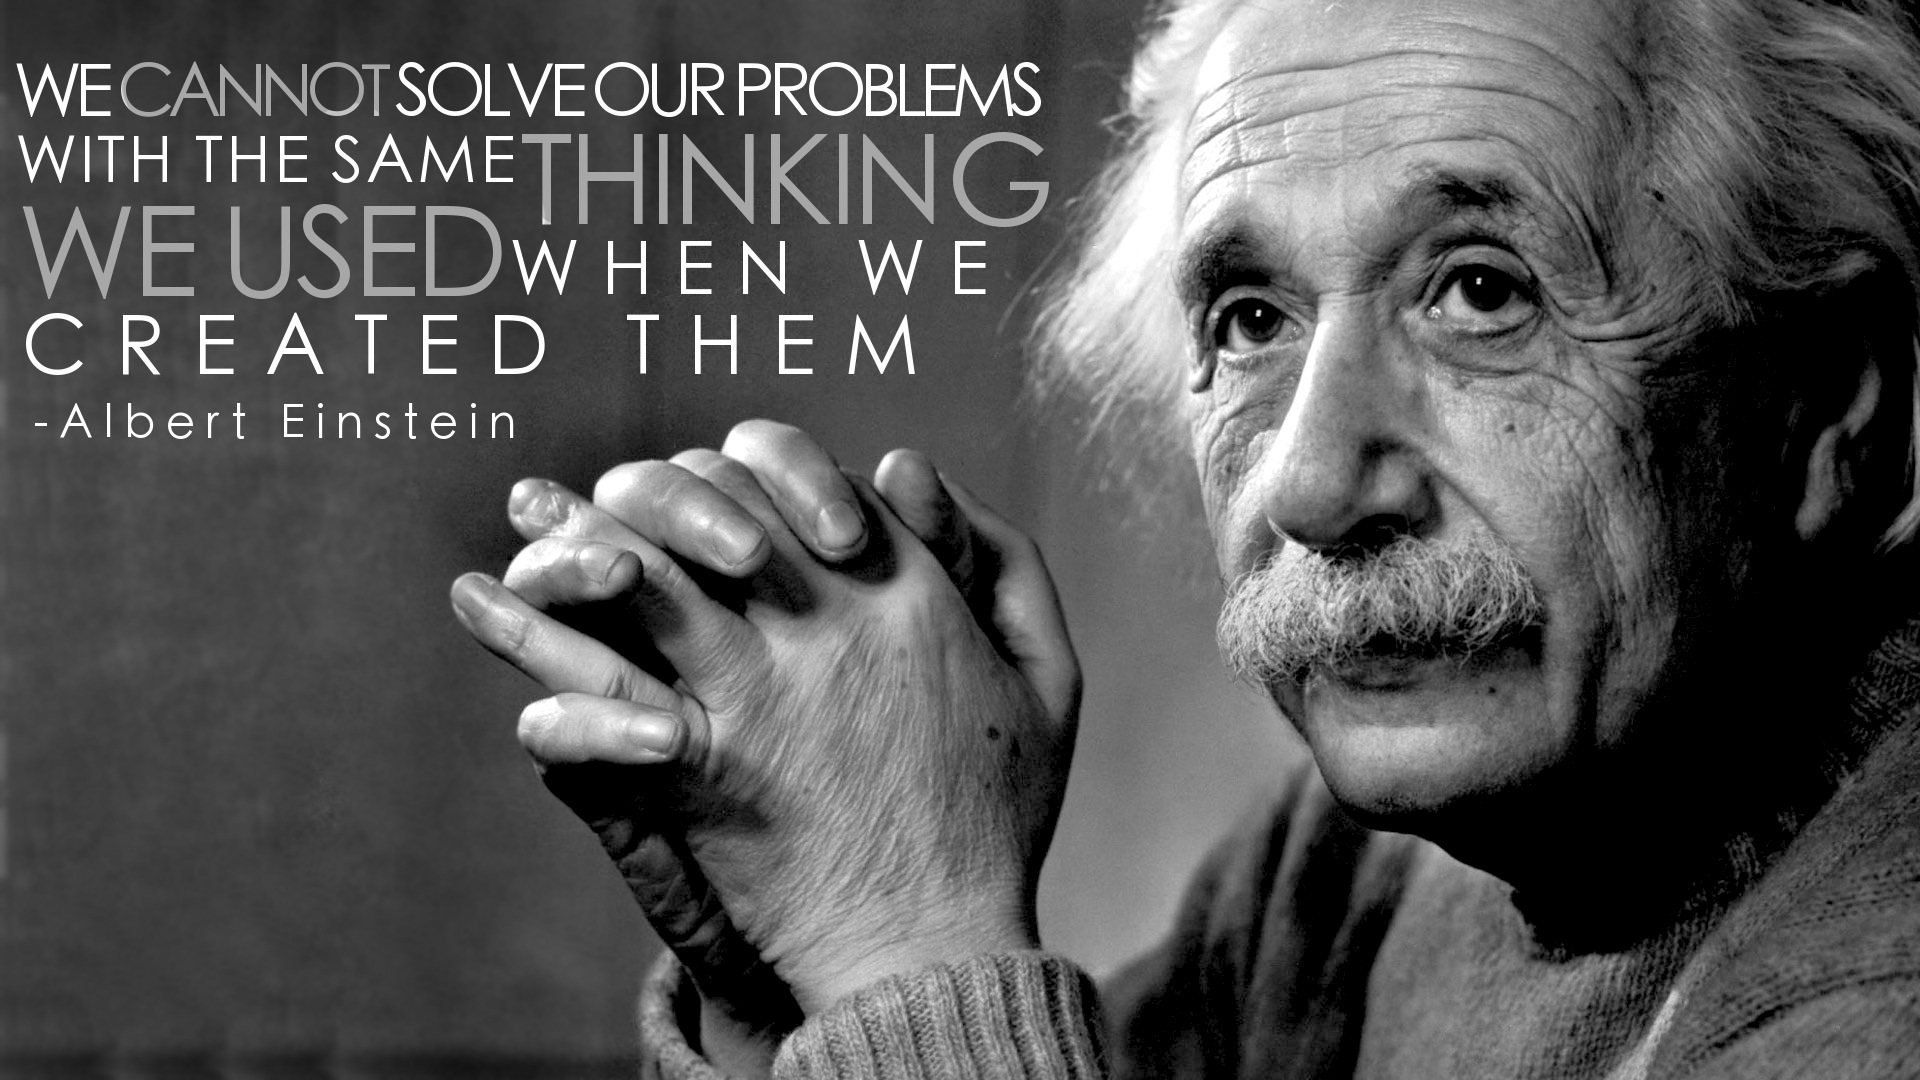 Formula rezolvarii problemelor de la Einstein si de ce faceti greseli